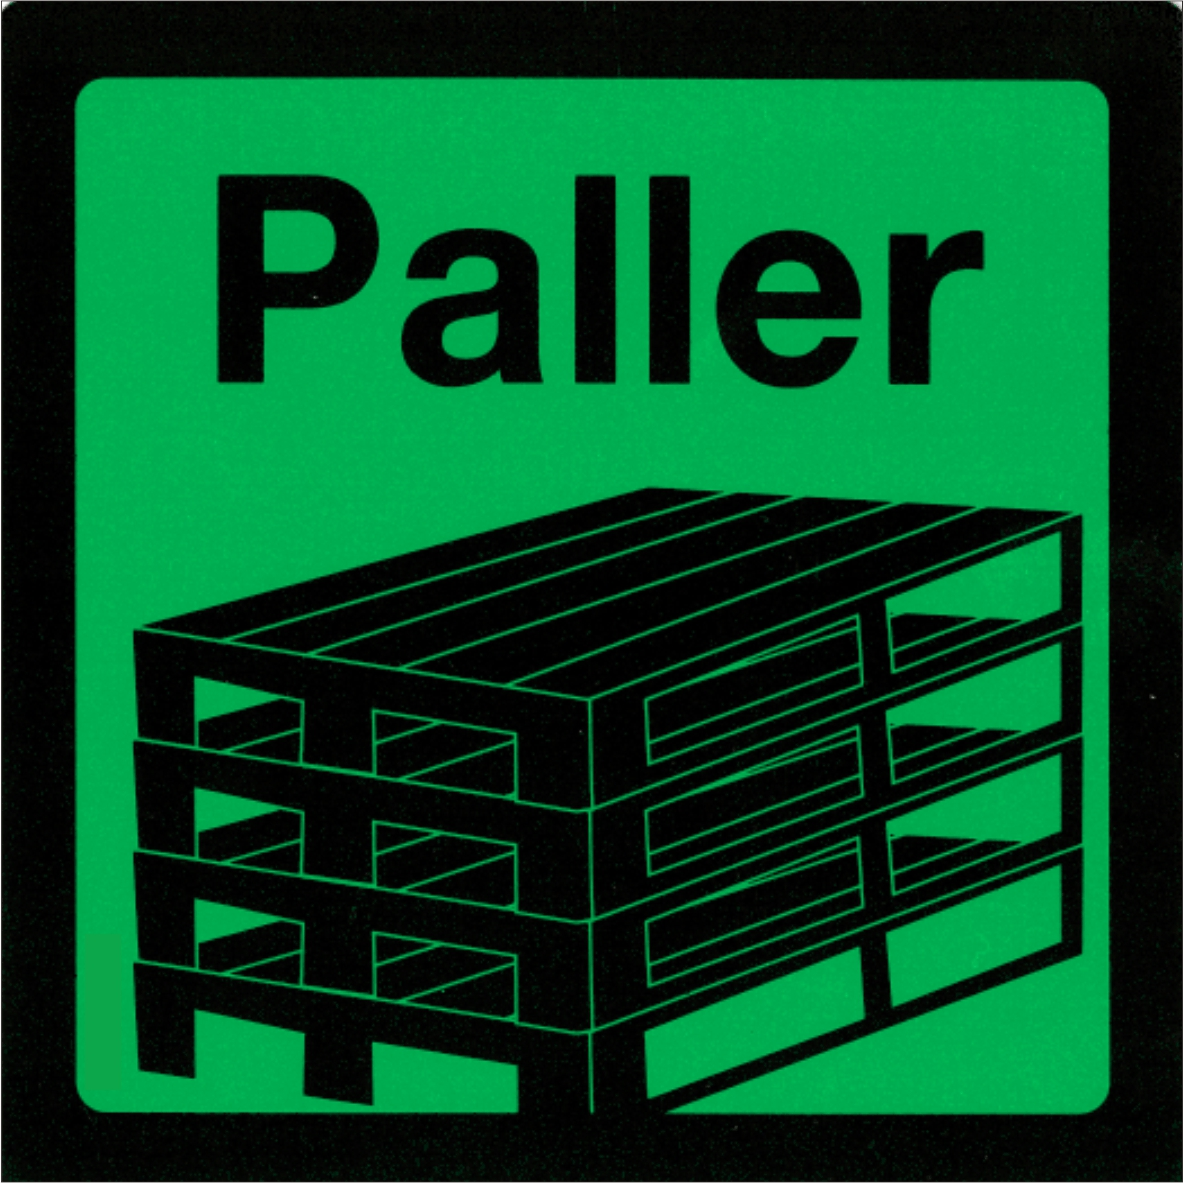 Paller